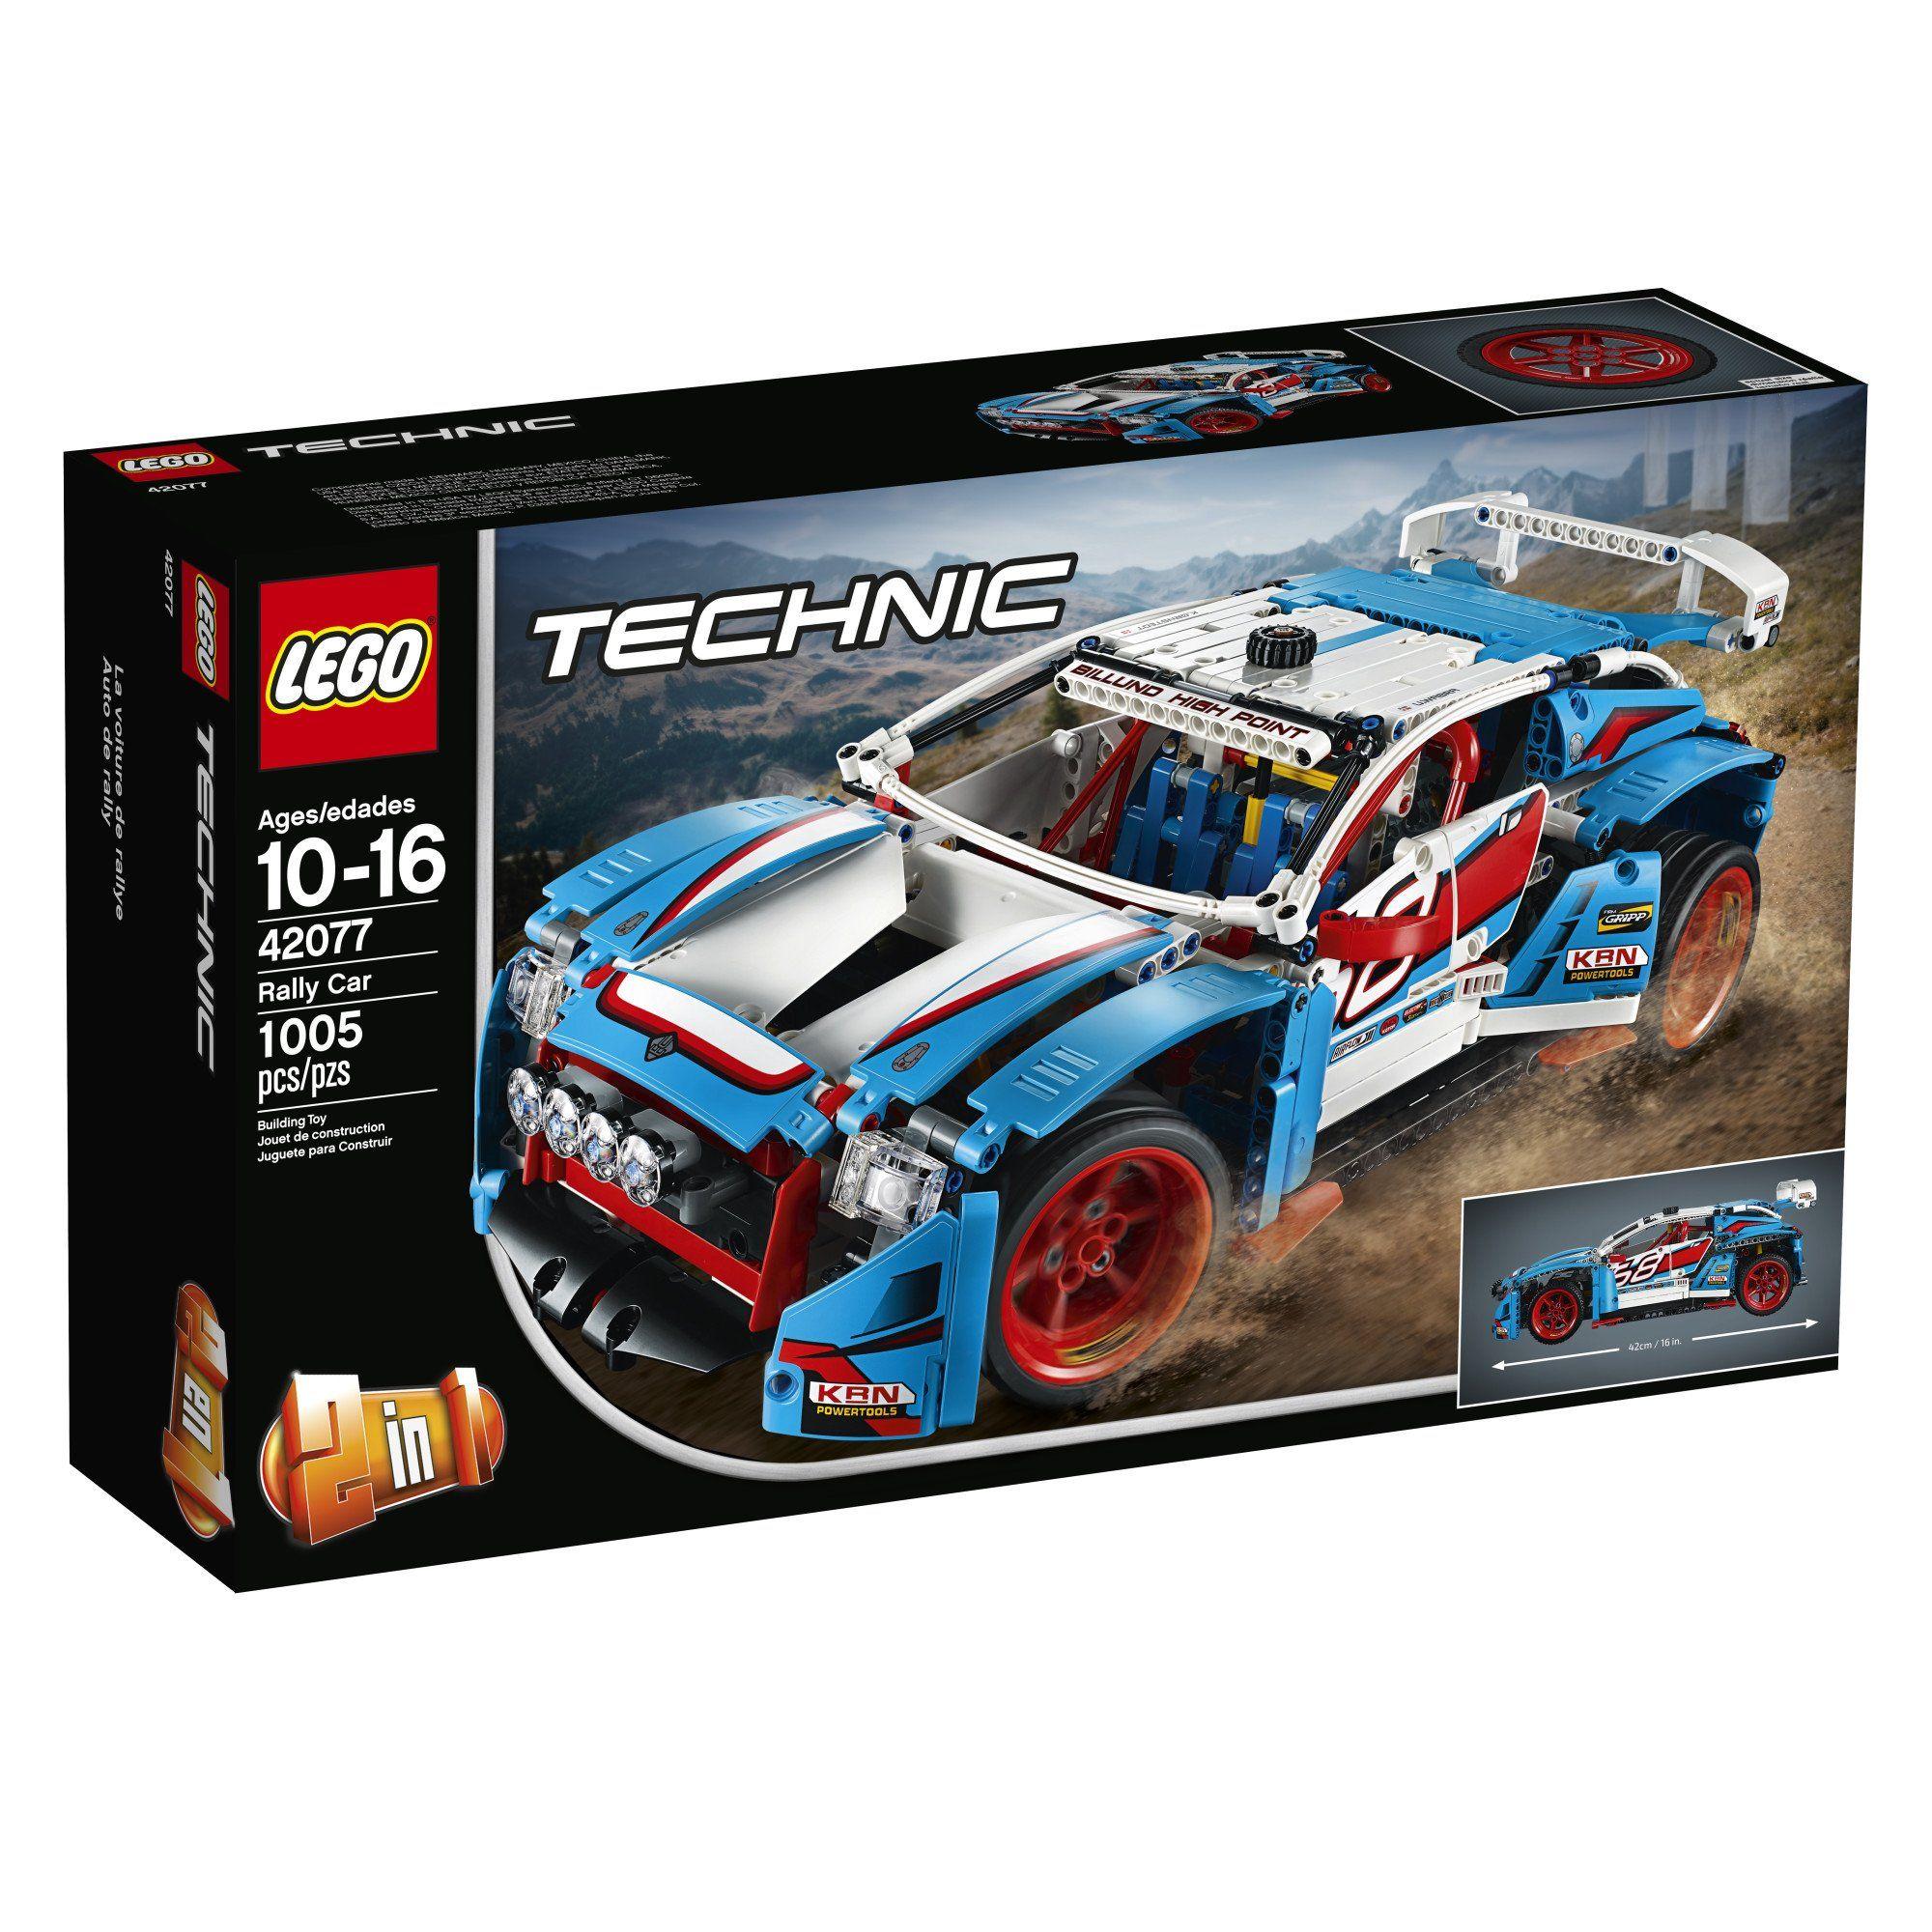 LEGO Technic Rally Car 42077 Building Kit 1005 Piece